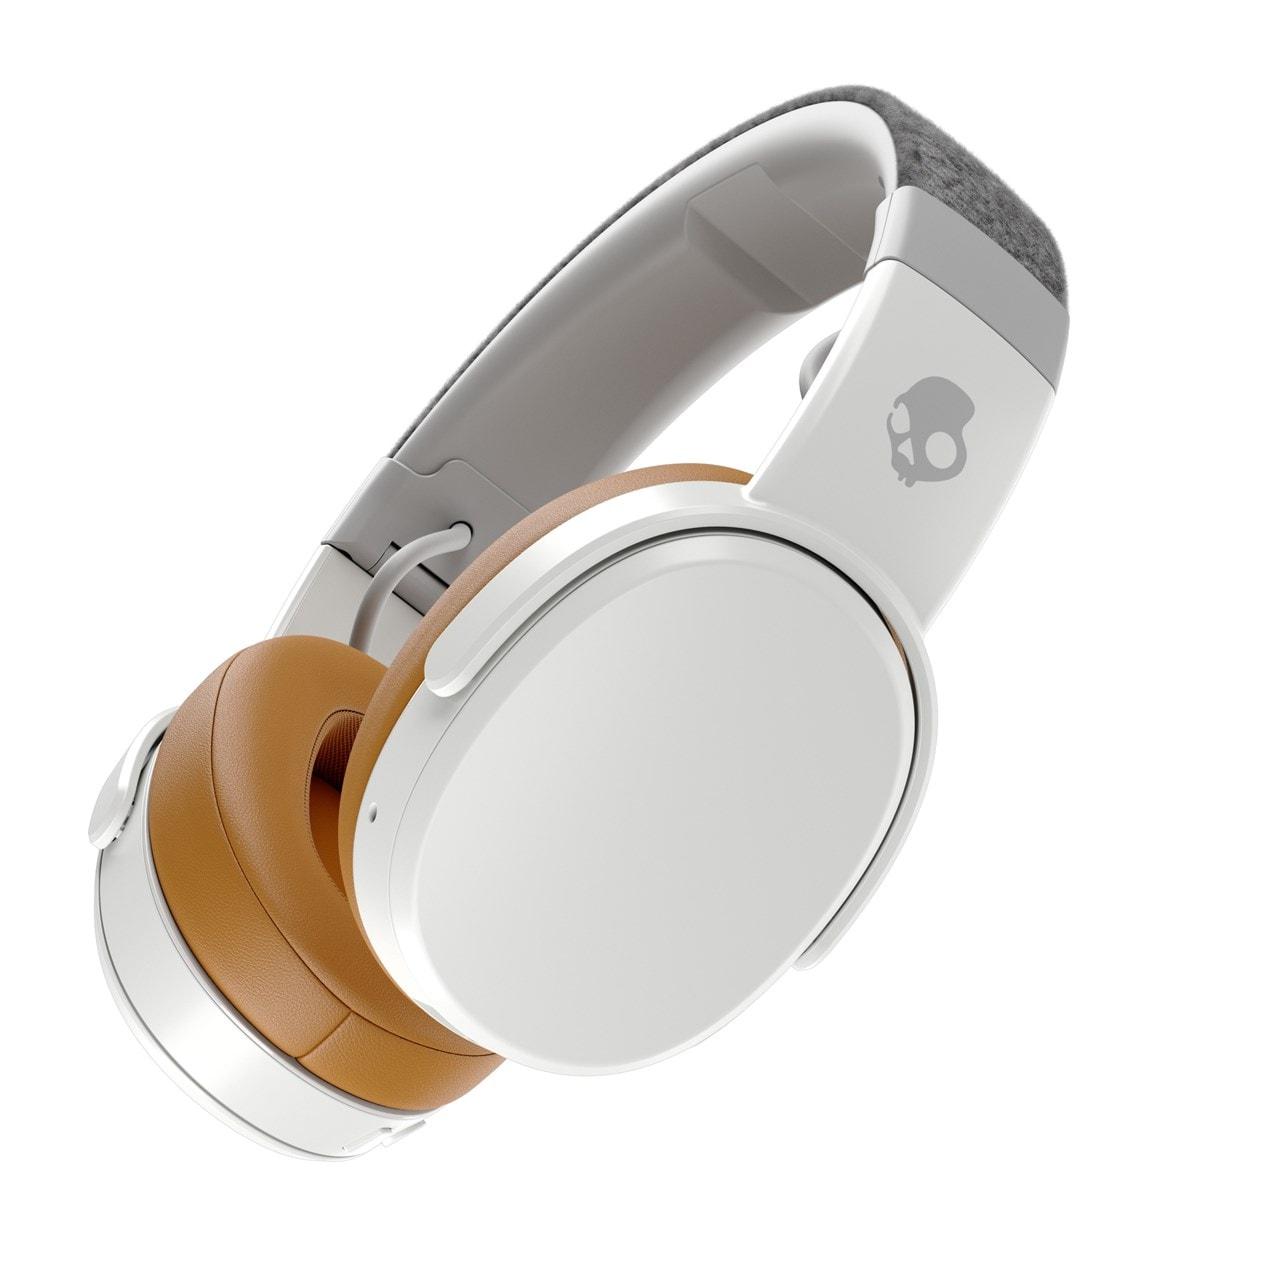 Skullcandy Crusher Grey/Tan Bluetooth Headphones - 2